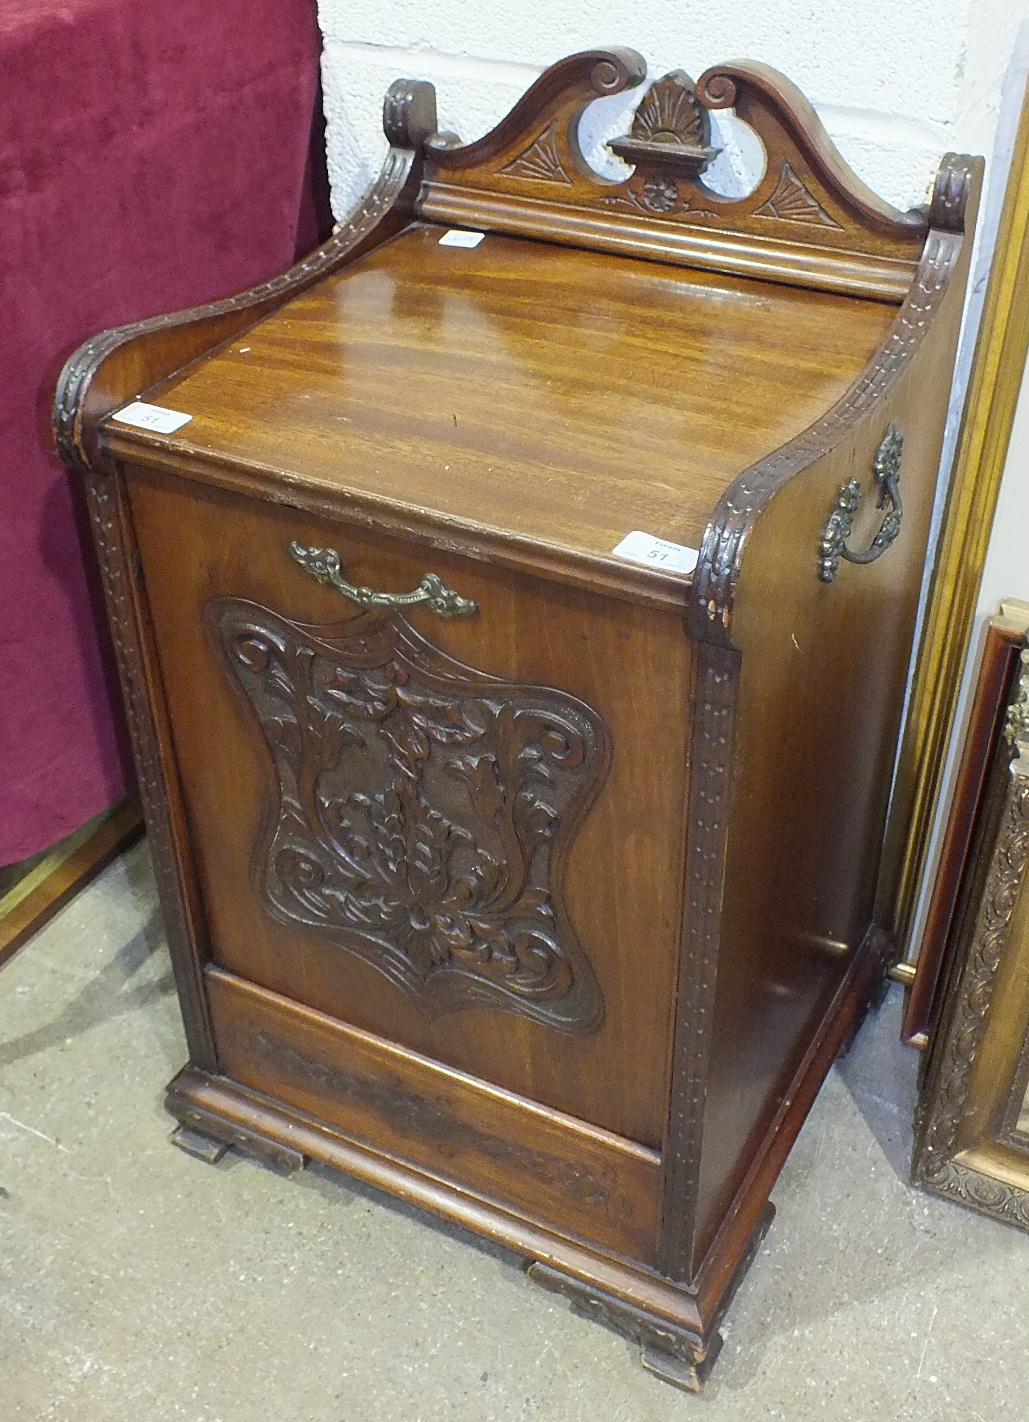 Lot 51 - An Edwardian mahogany coal purdonium with metal carrying handles, (metal interior lacking), 38cm